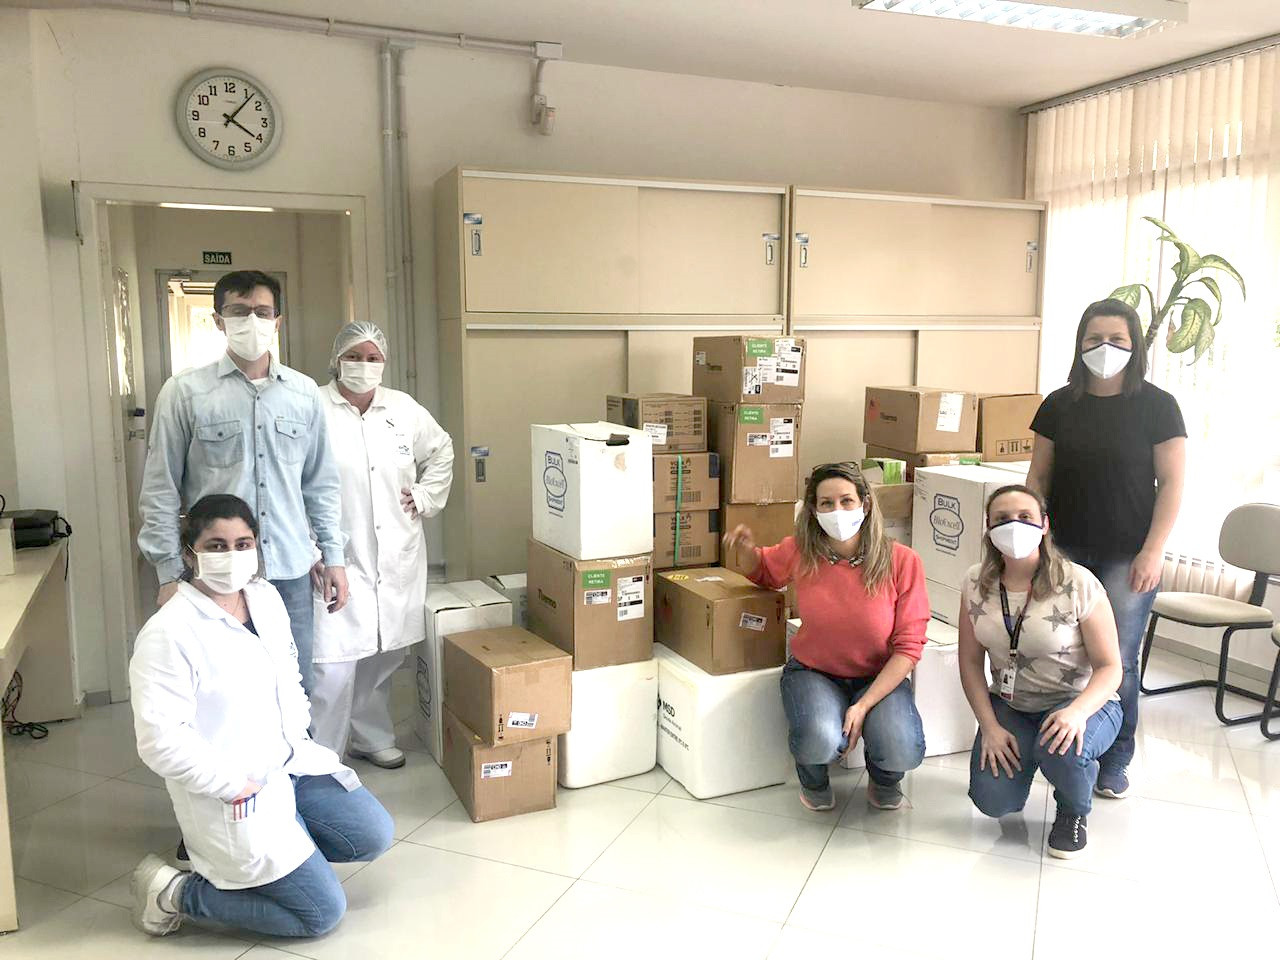 BRF entrega insumos para auxiliar a Embrapa nos diagnósticos de Covid-19